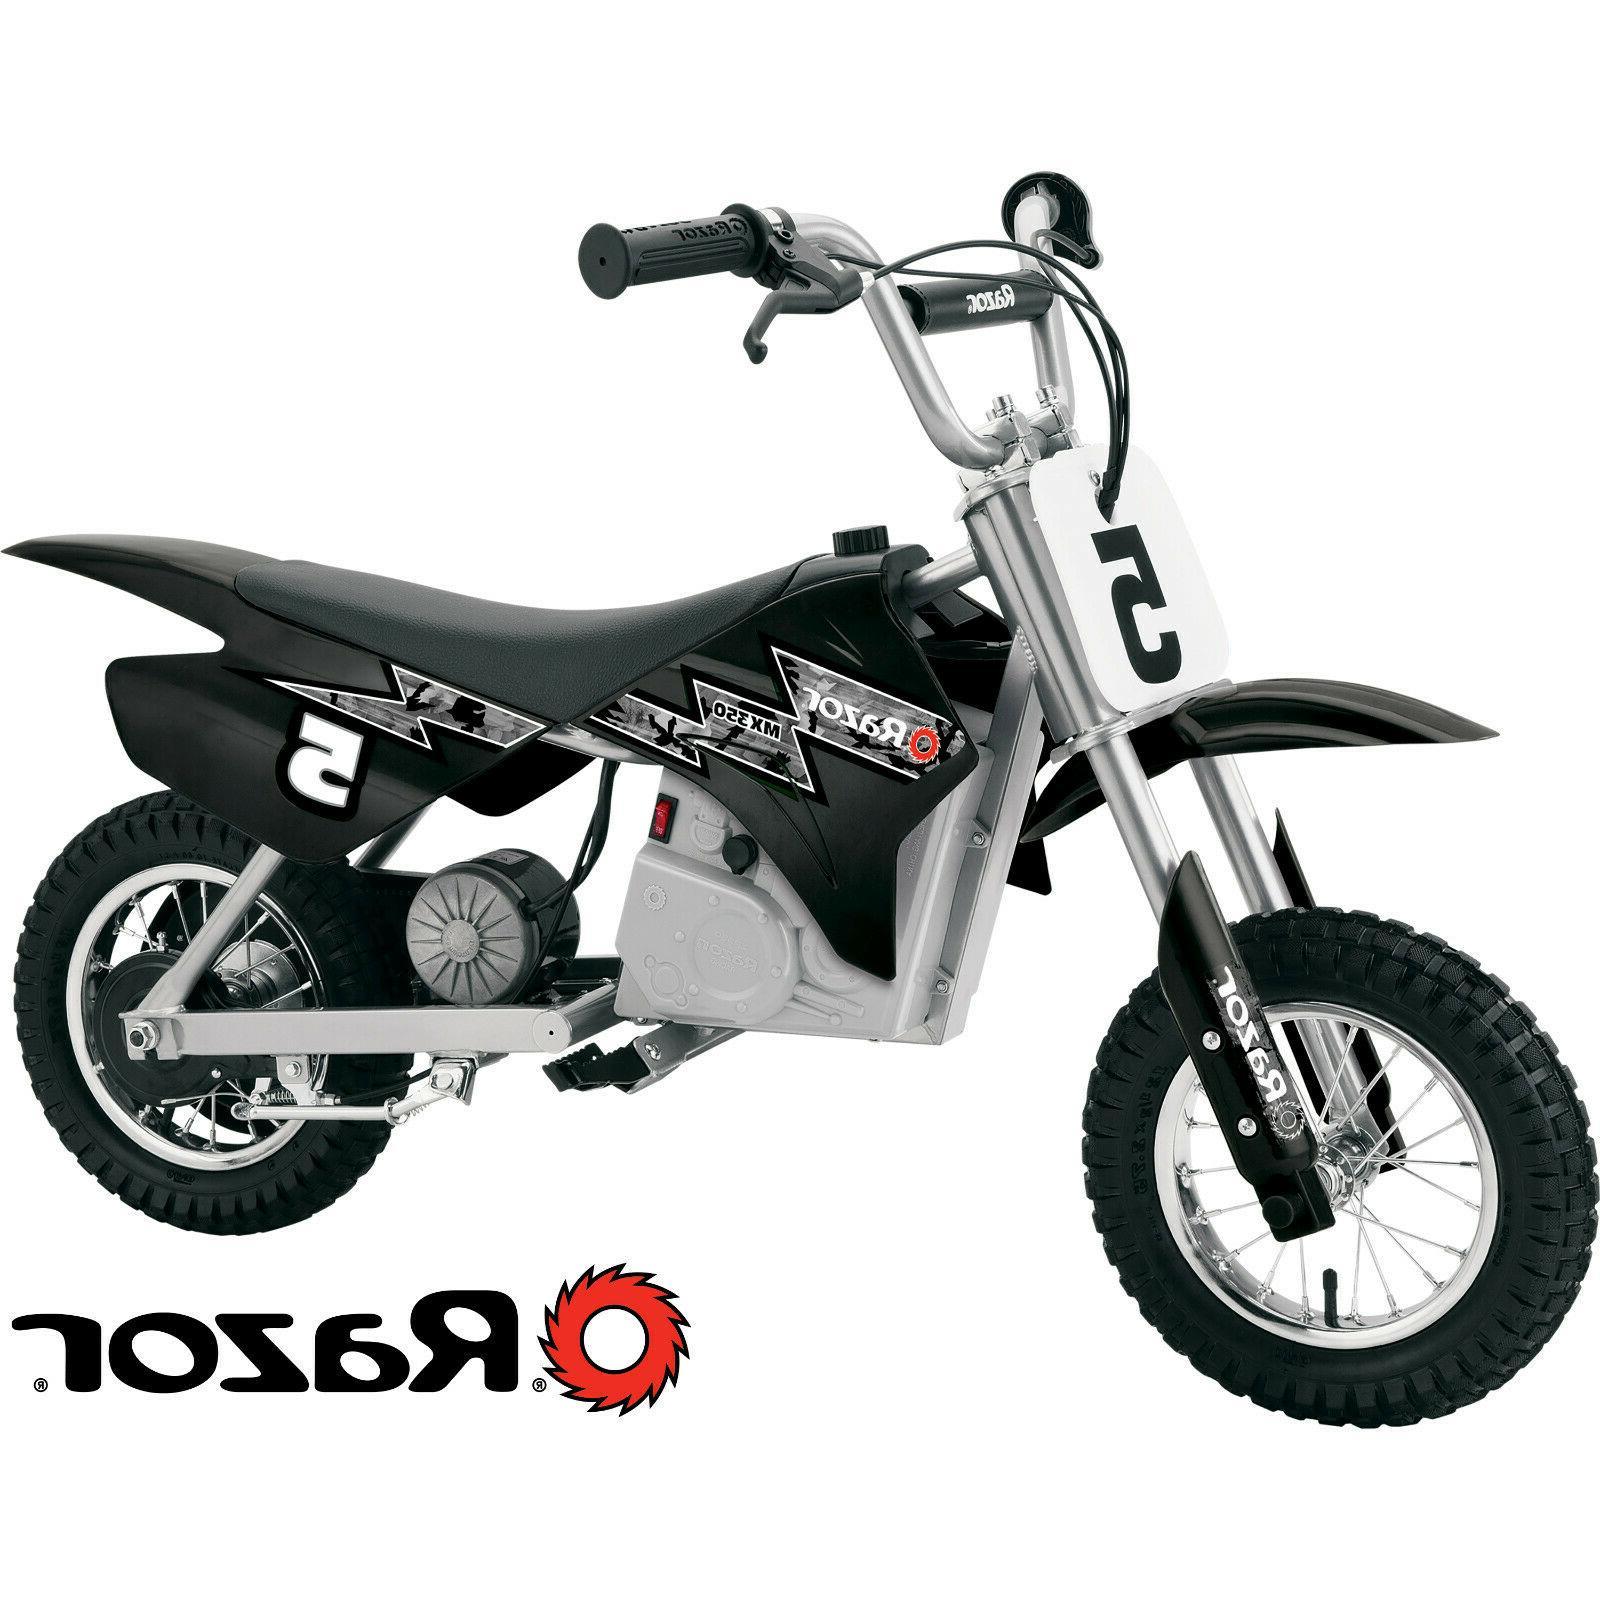 Razor Dirt Rocket MX350 Electric 24v Ride On Dirt Bike, spee